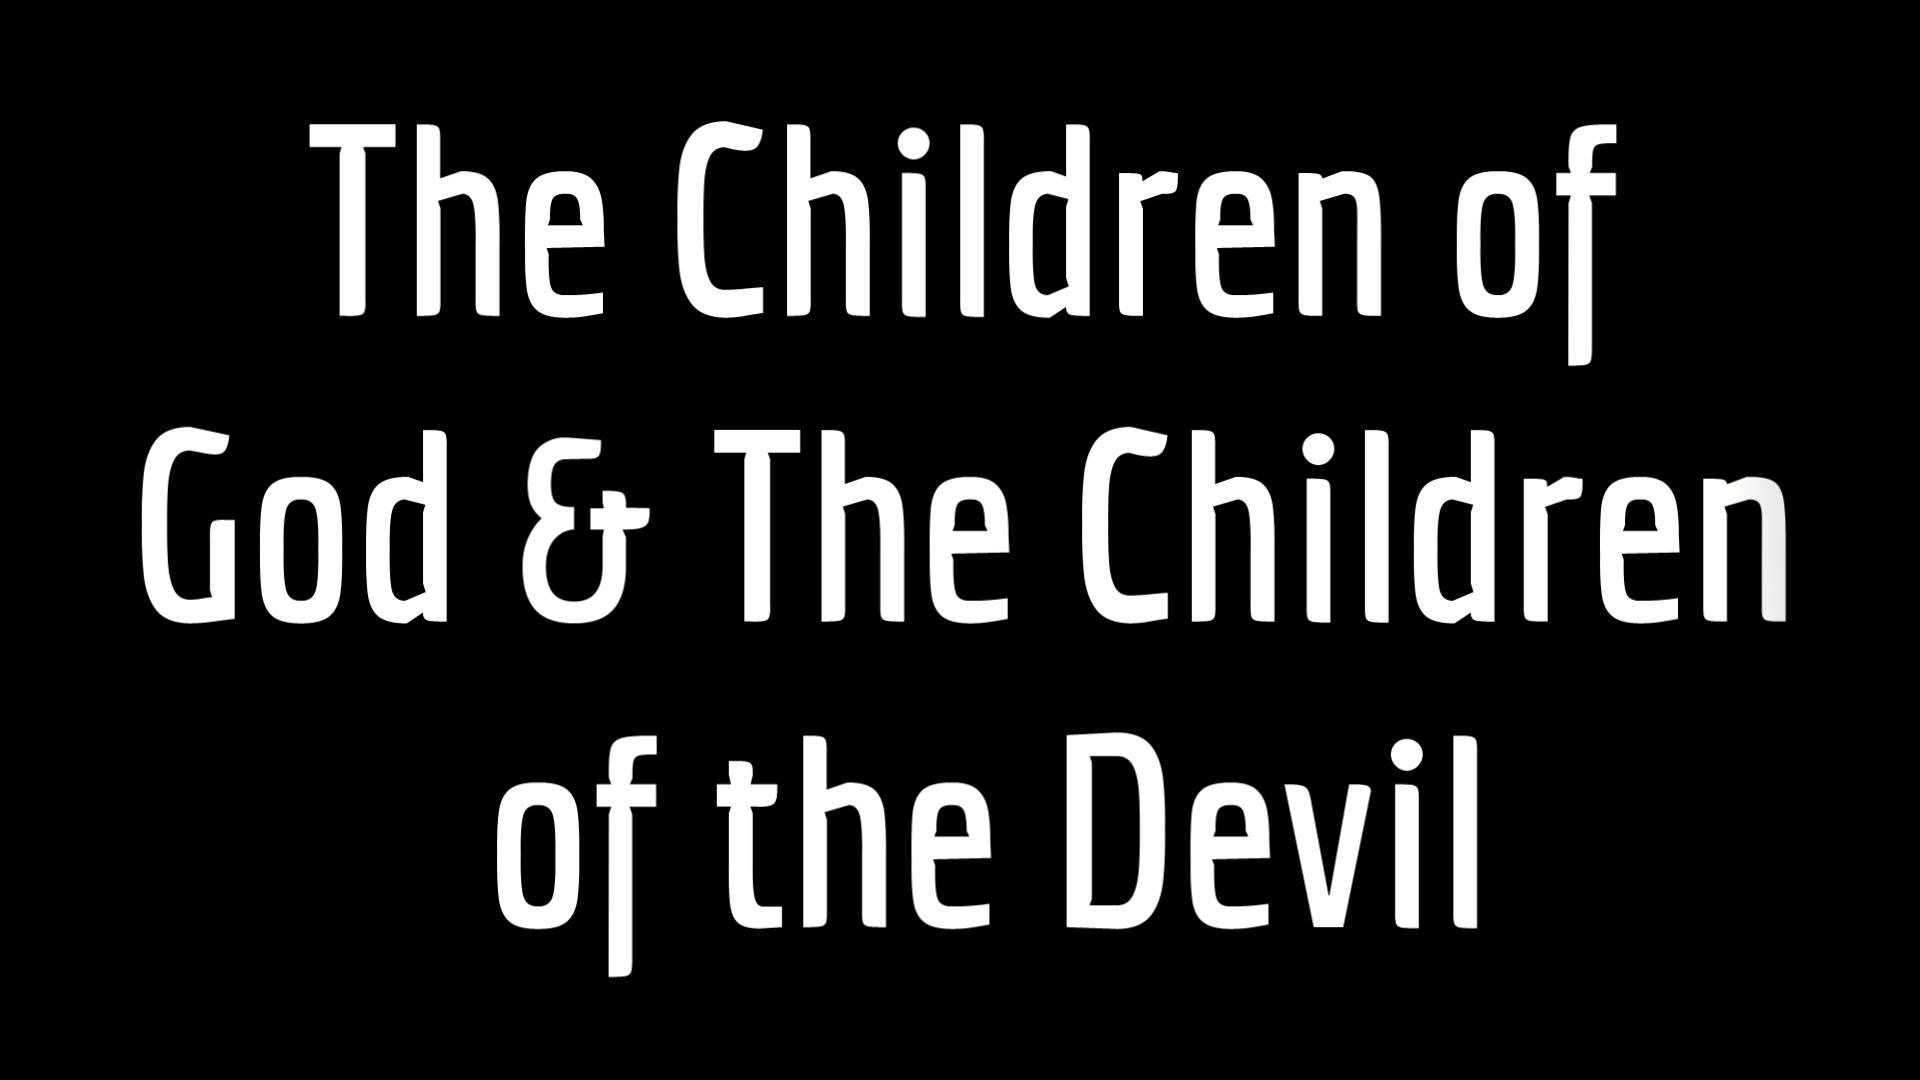 The Children are Manifest - I John 3:4-10 (Jeremy Bowling)